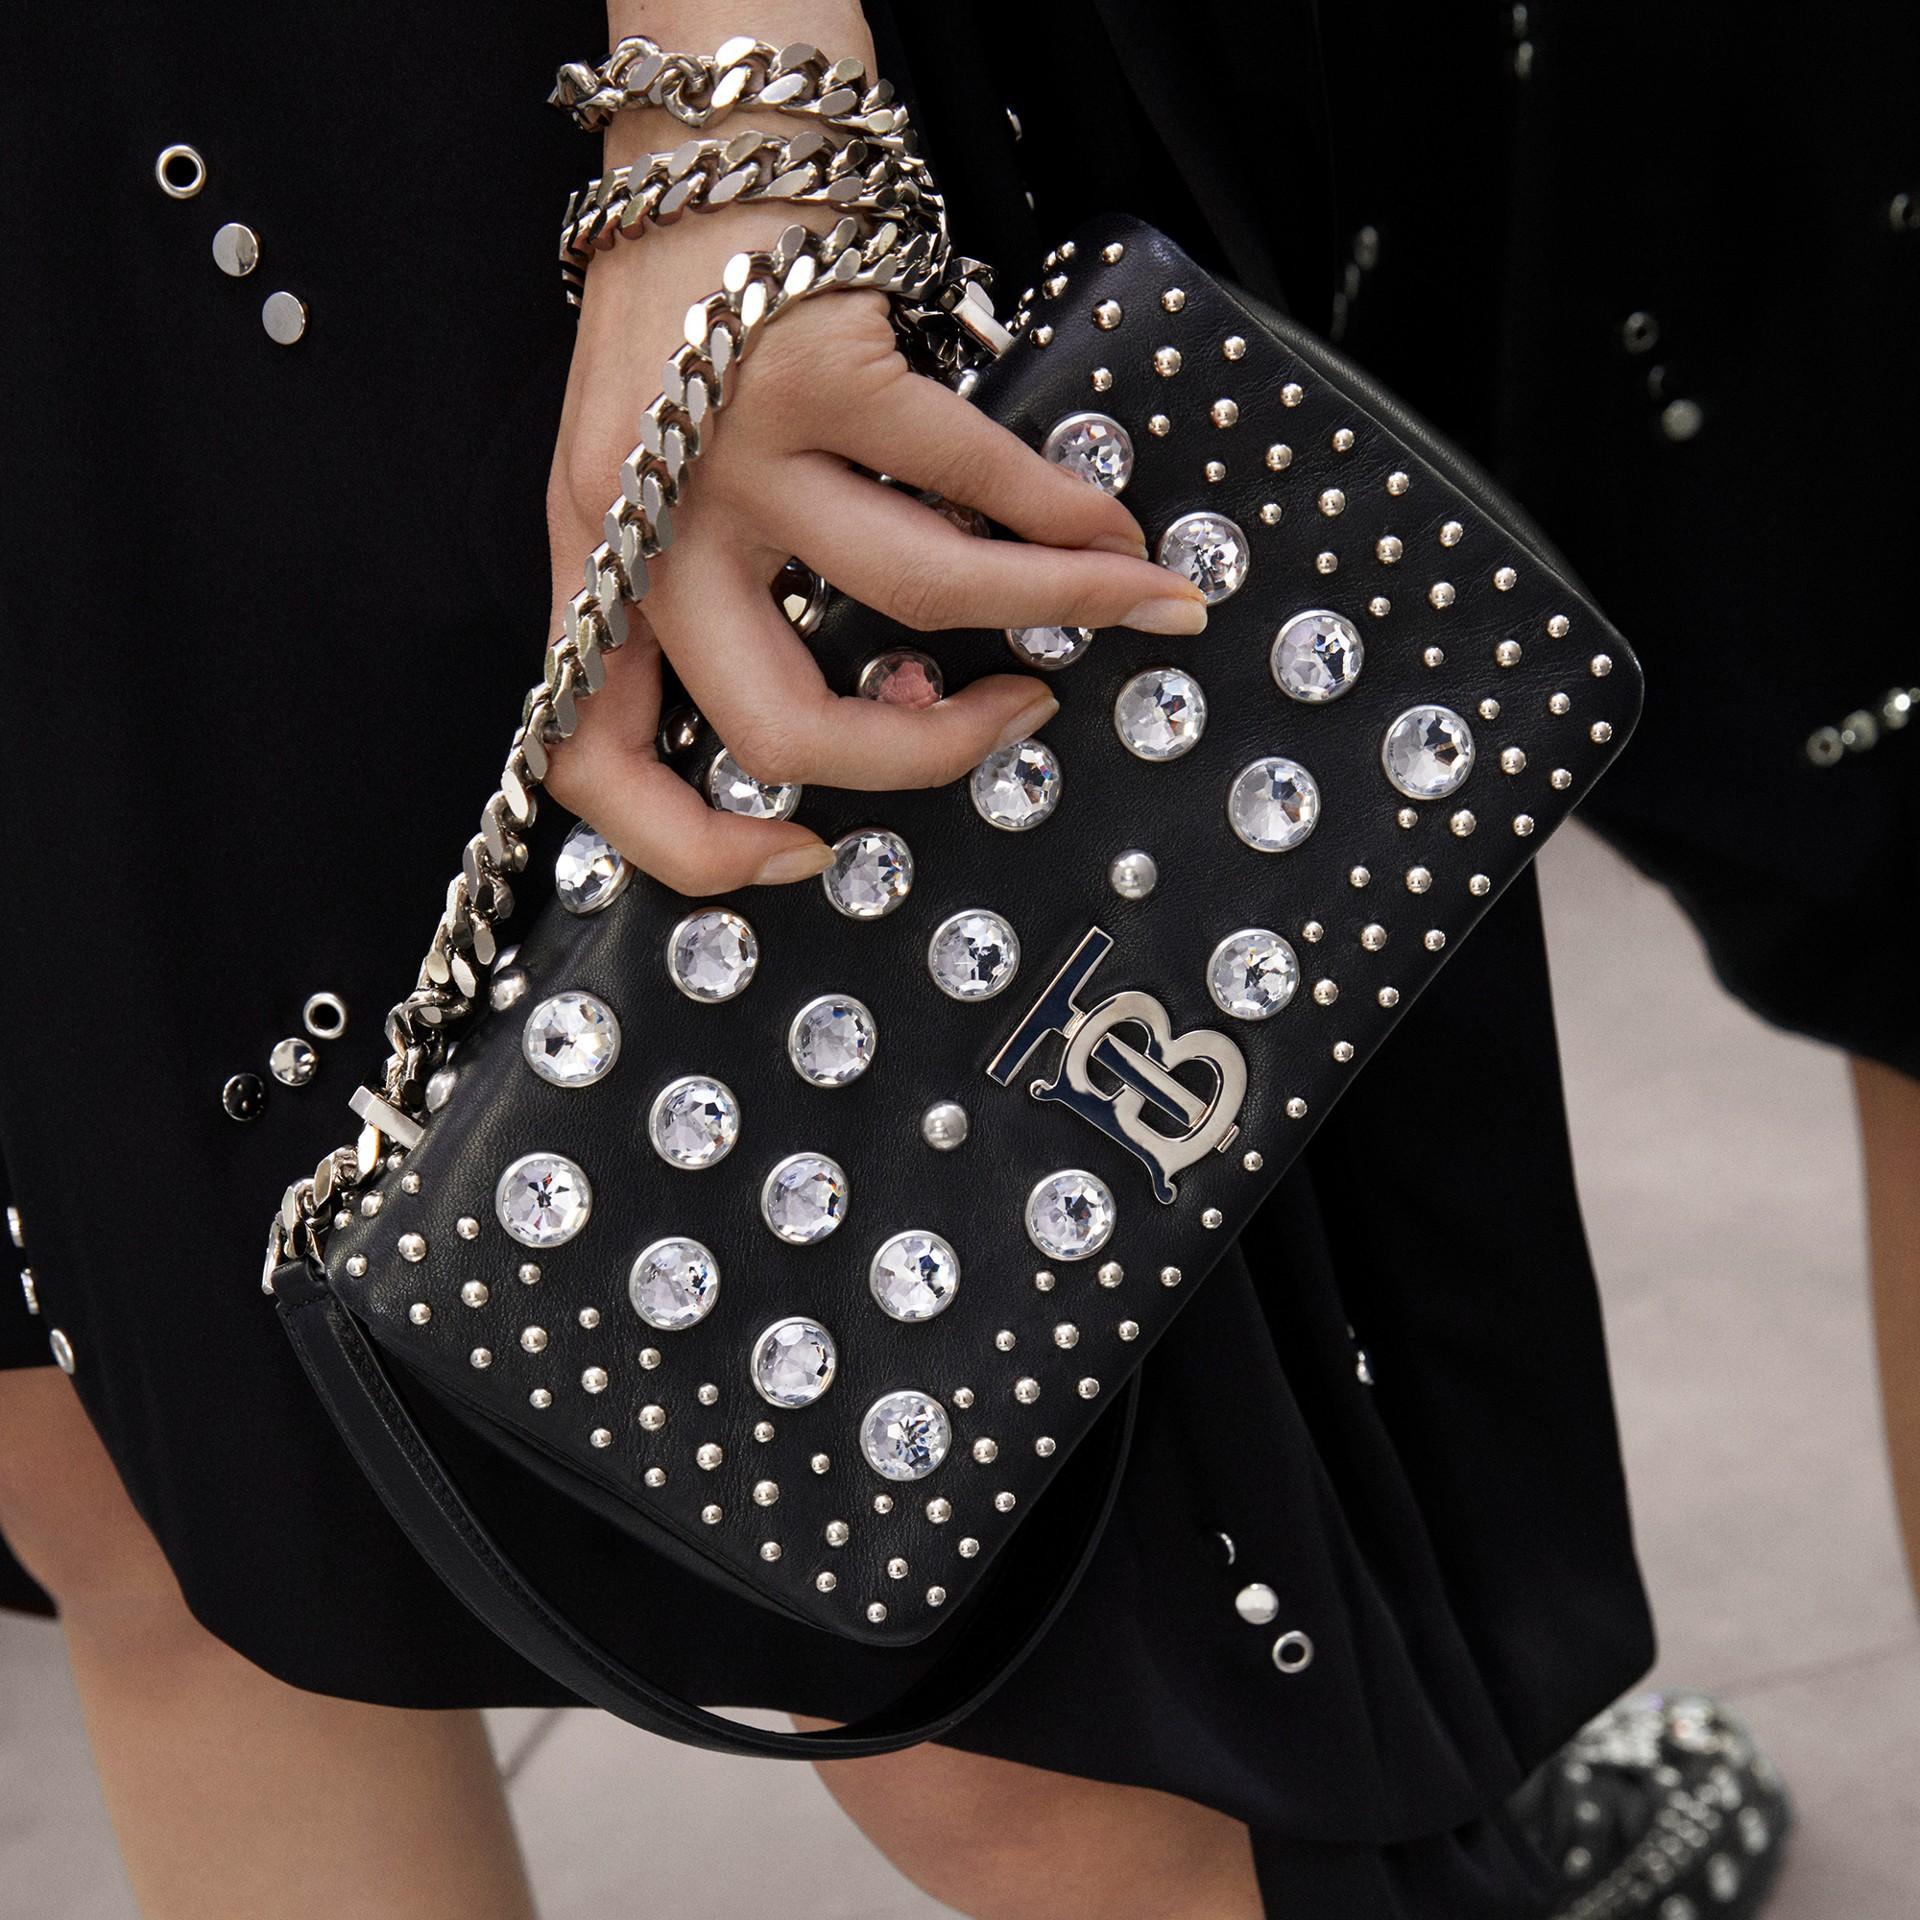 Small Embellished Lambskin Lola Bag in Black - Women | Burberry - gallery image 1